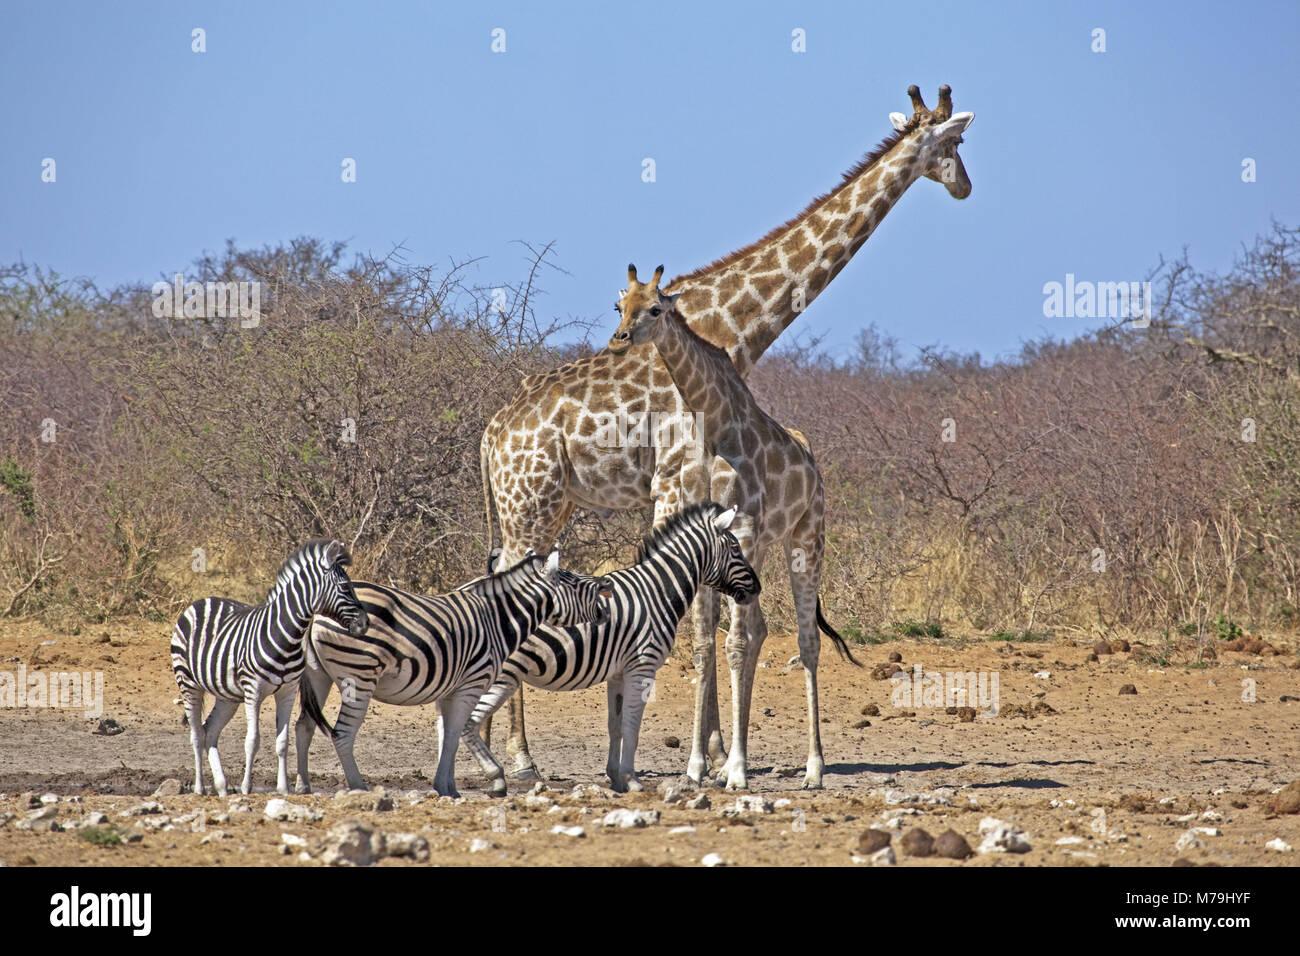 Giraffes Namibia Southern Africa Africa Stock Photos